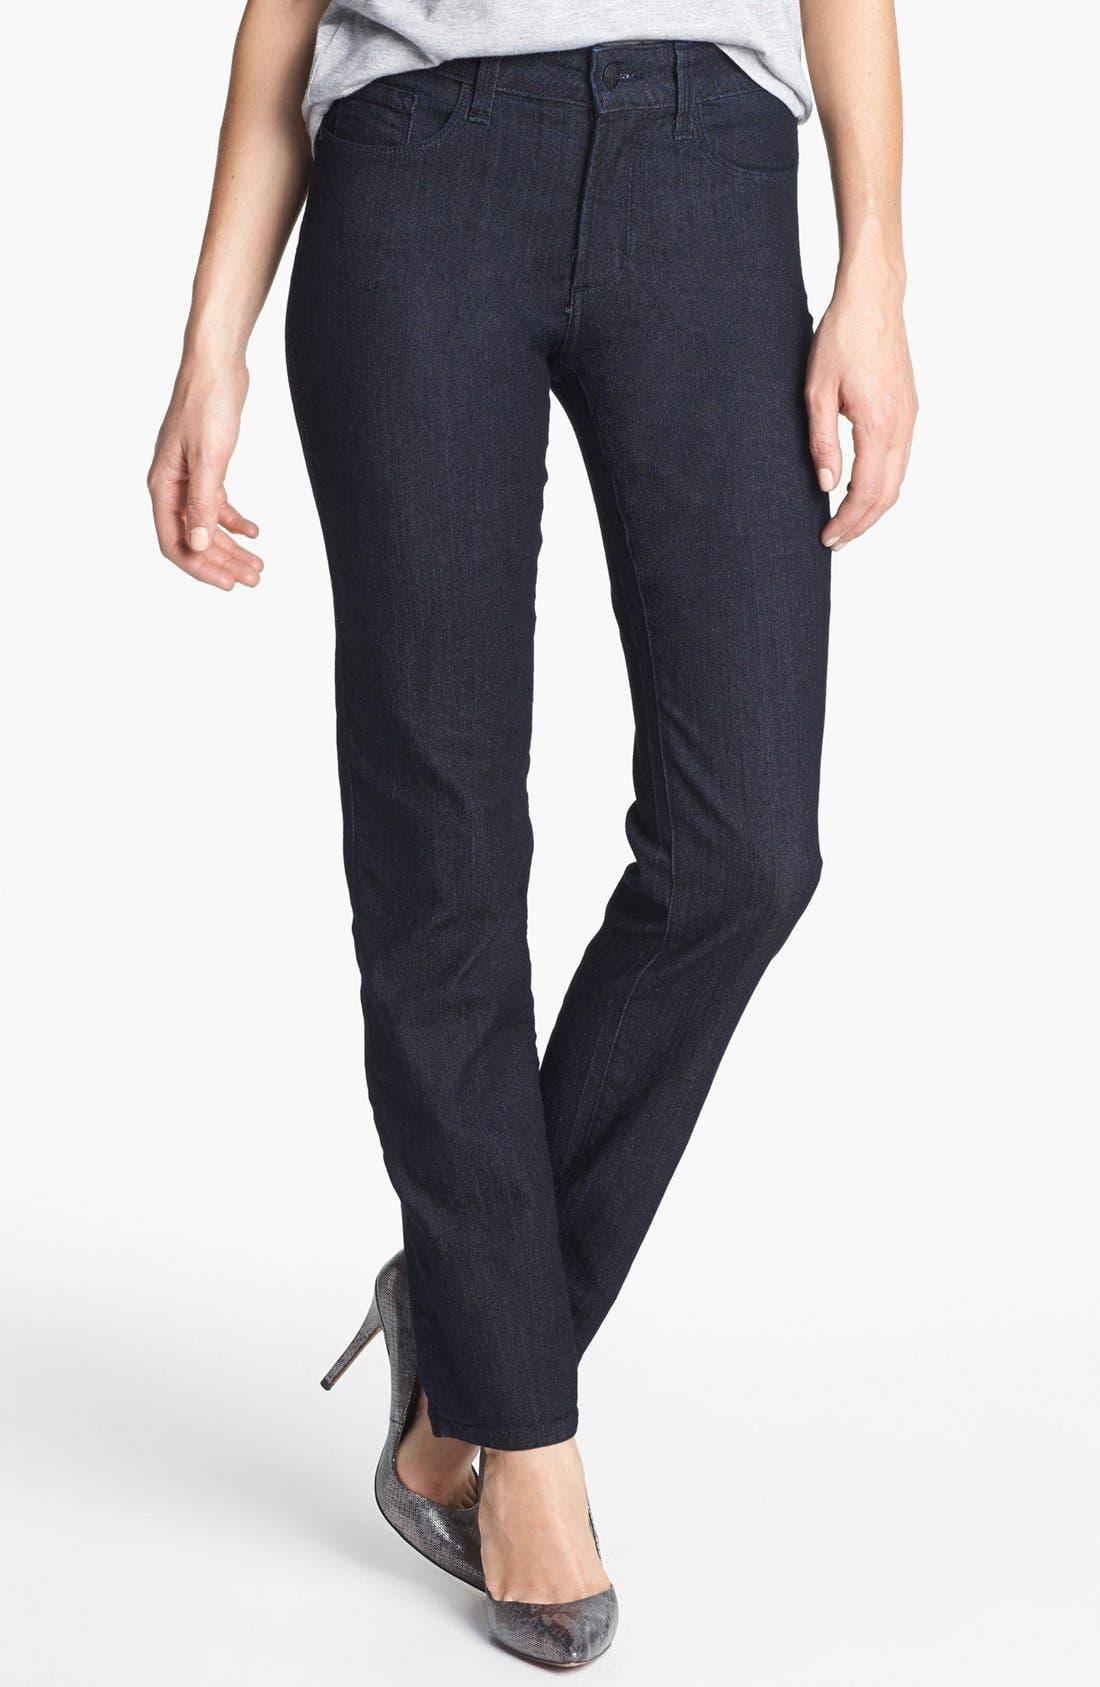 Alternate Image 1 Selected - NYDJ 'Sheri' Stretch Skinny Jeans (Petite)